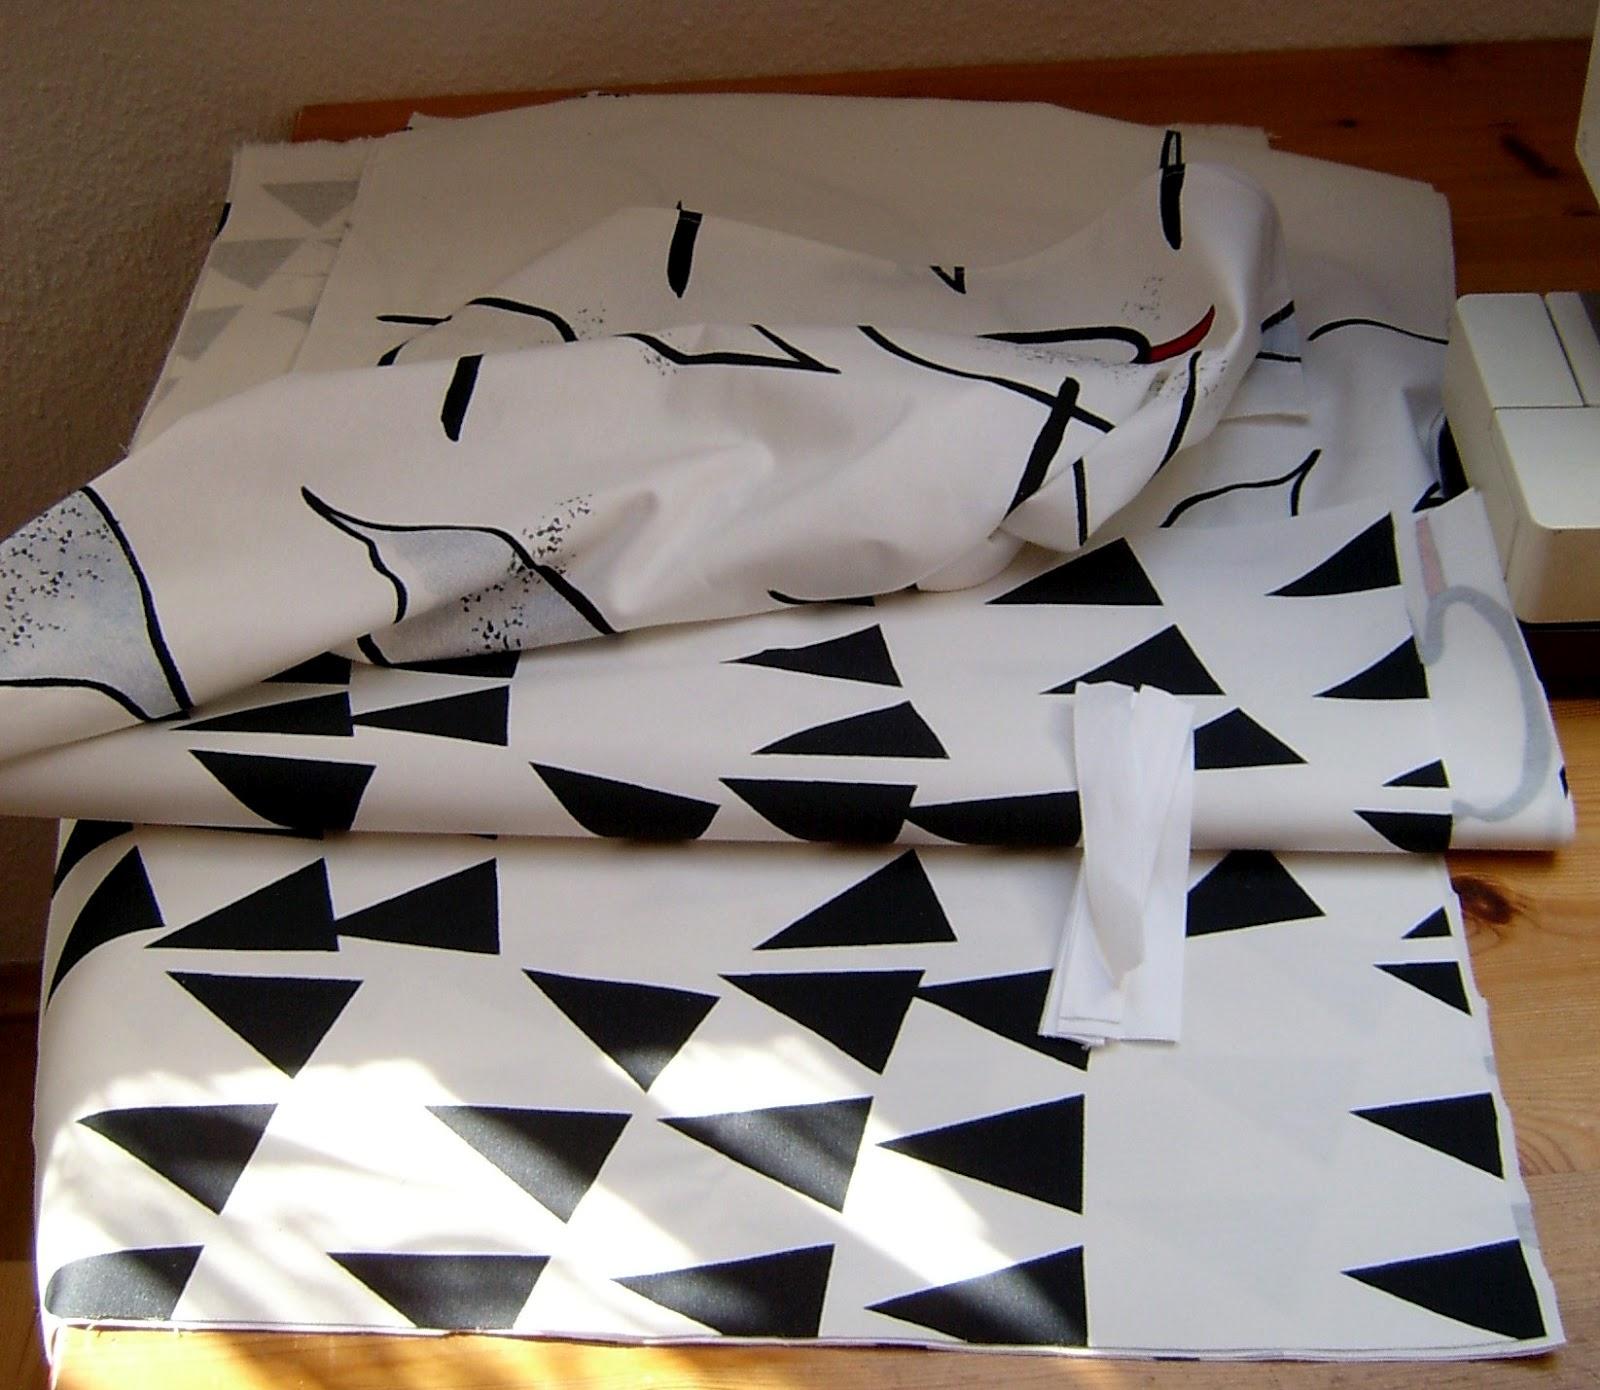 aus skraven 39 s n hk stchen auch alltagsgegenst nde n he ich. Black Bedroom Furniture Sets. Home Design Ideas